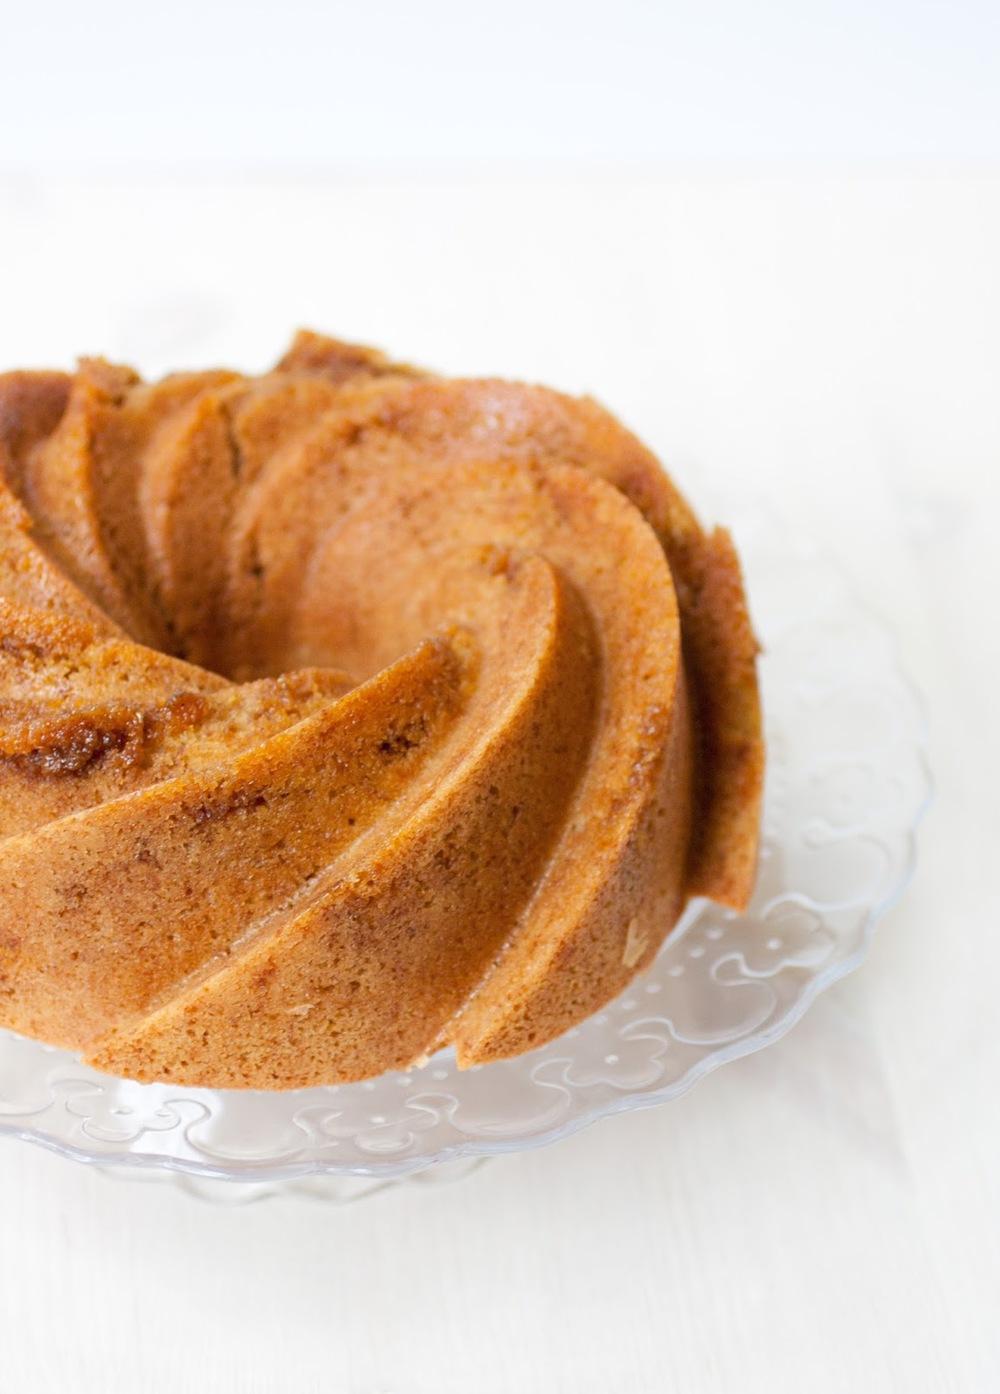 Spiced-Bundt-Cake-2.jpg